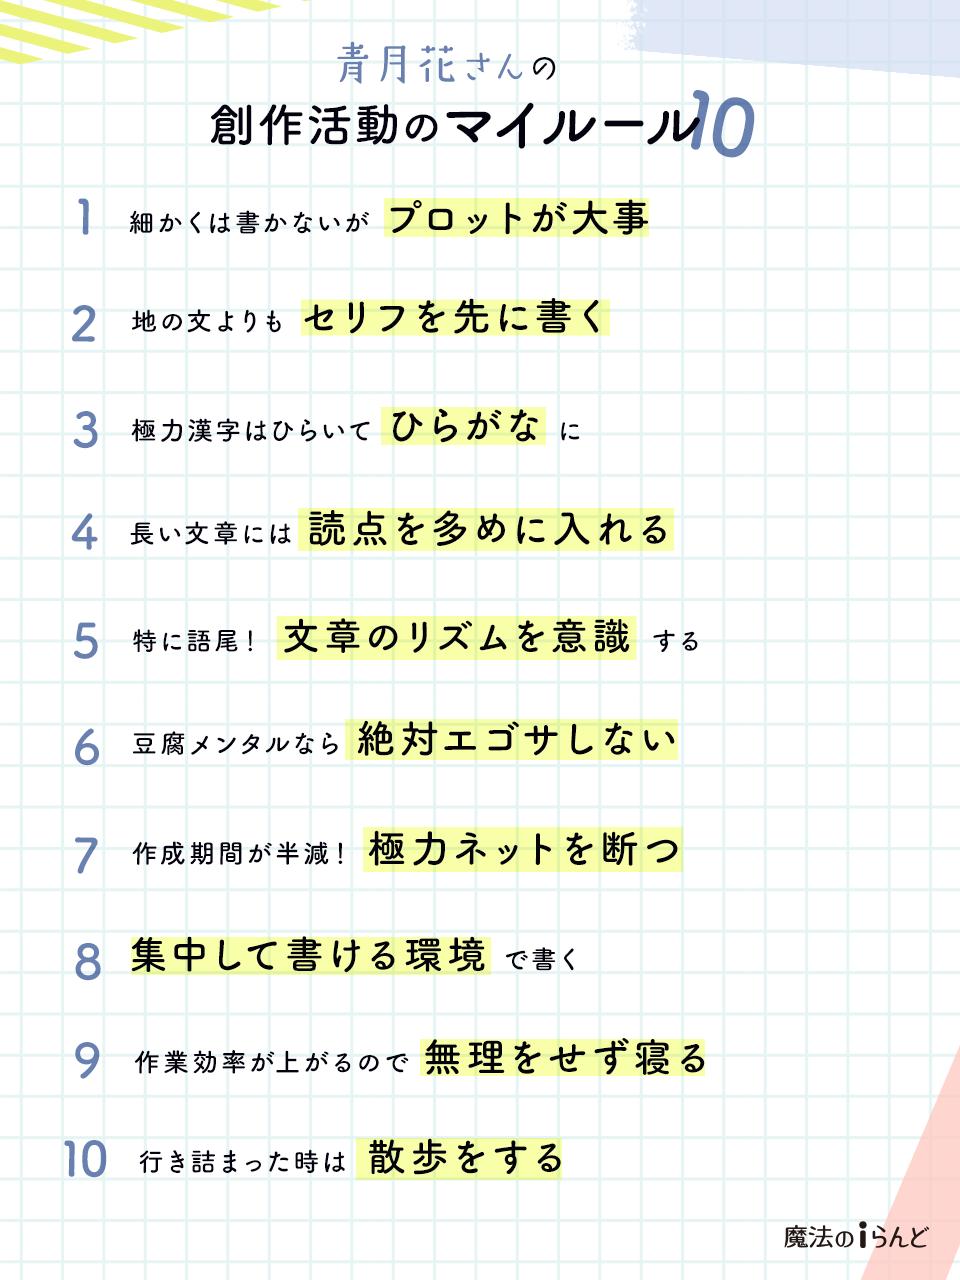 https://storage.googleapis.com/blog-info/entry/2021/08/07-myrule-aotsuki_twitter.png